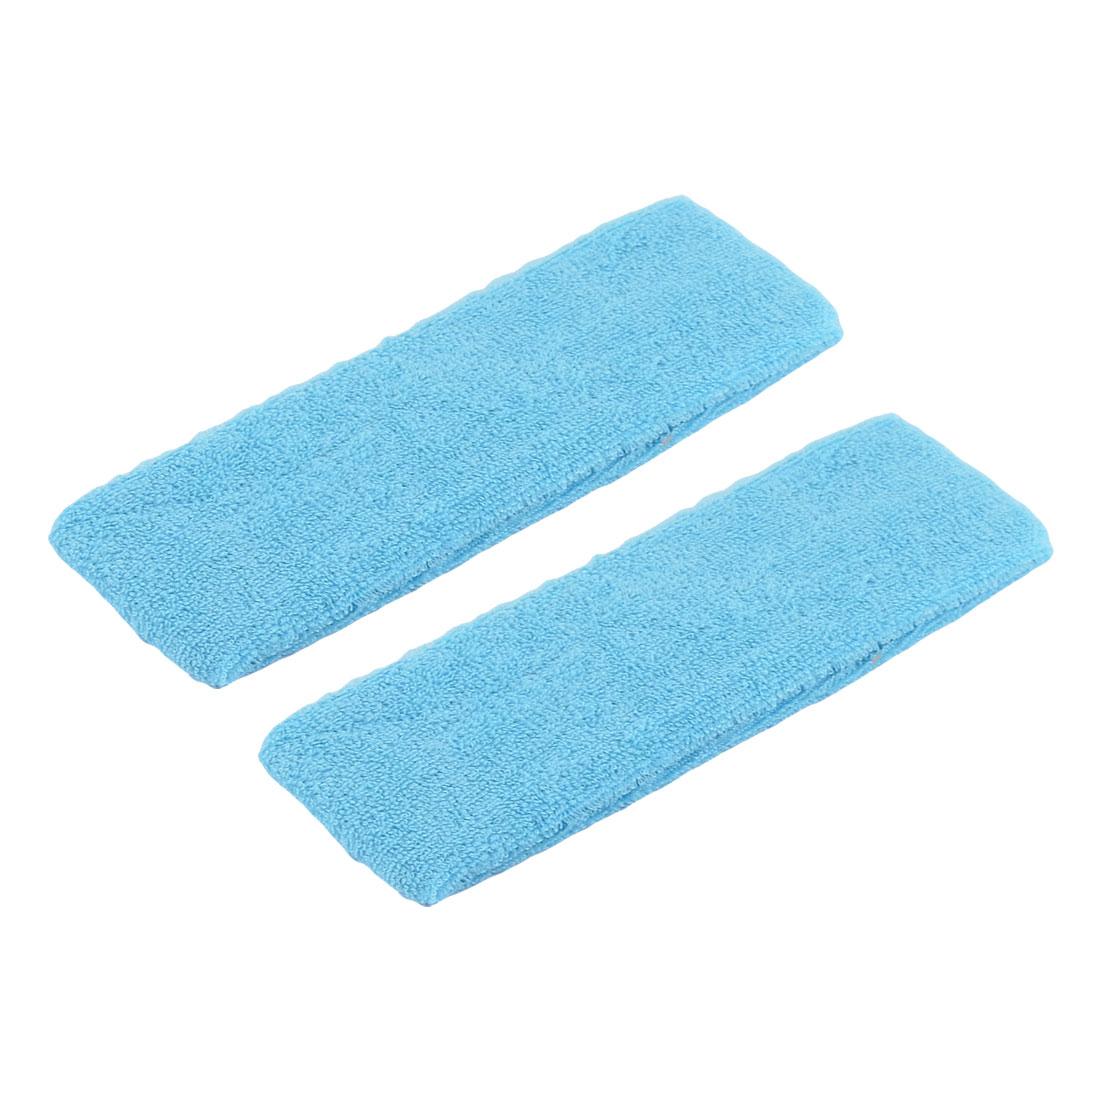 Woman Elastic Fabric Headband Sports Sweatband Light Blue 2pcs